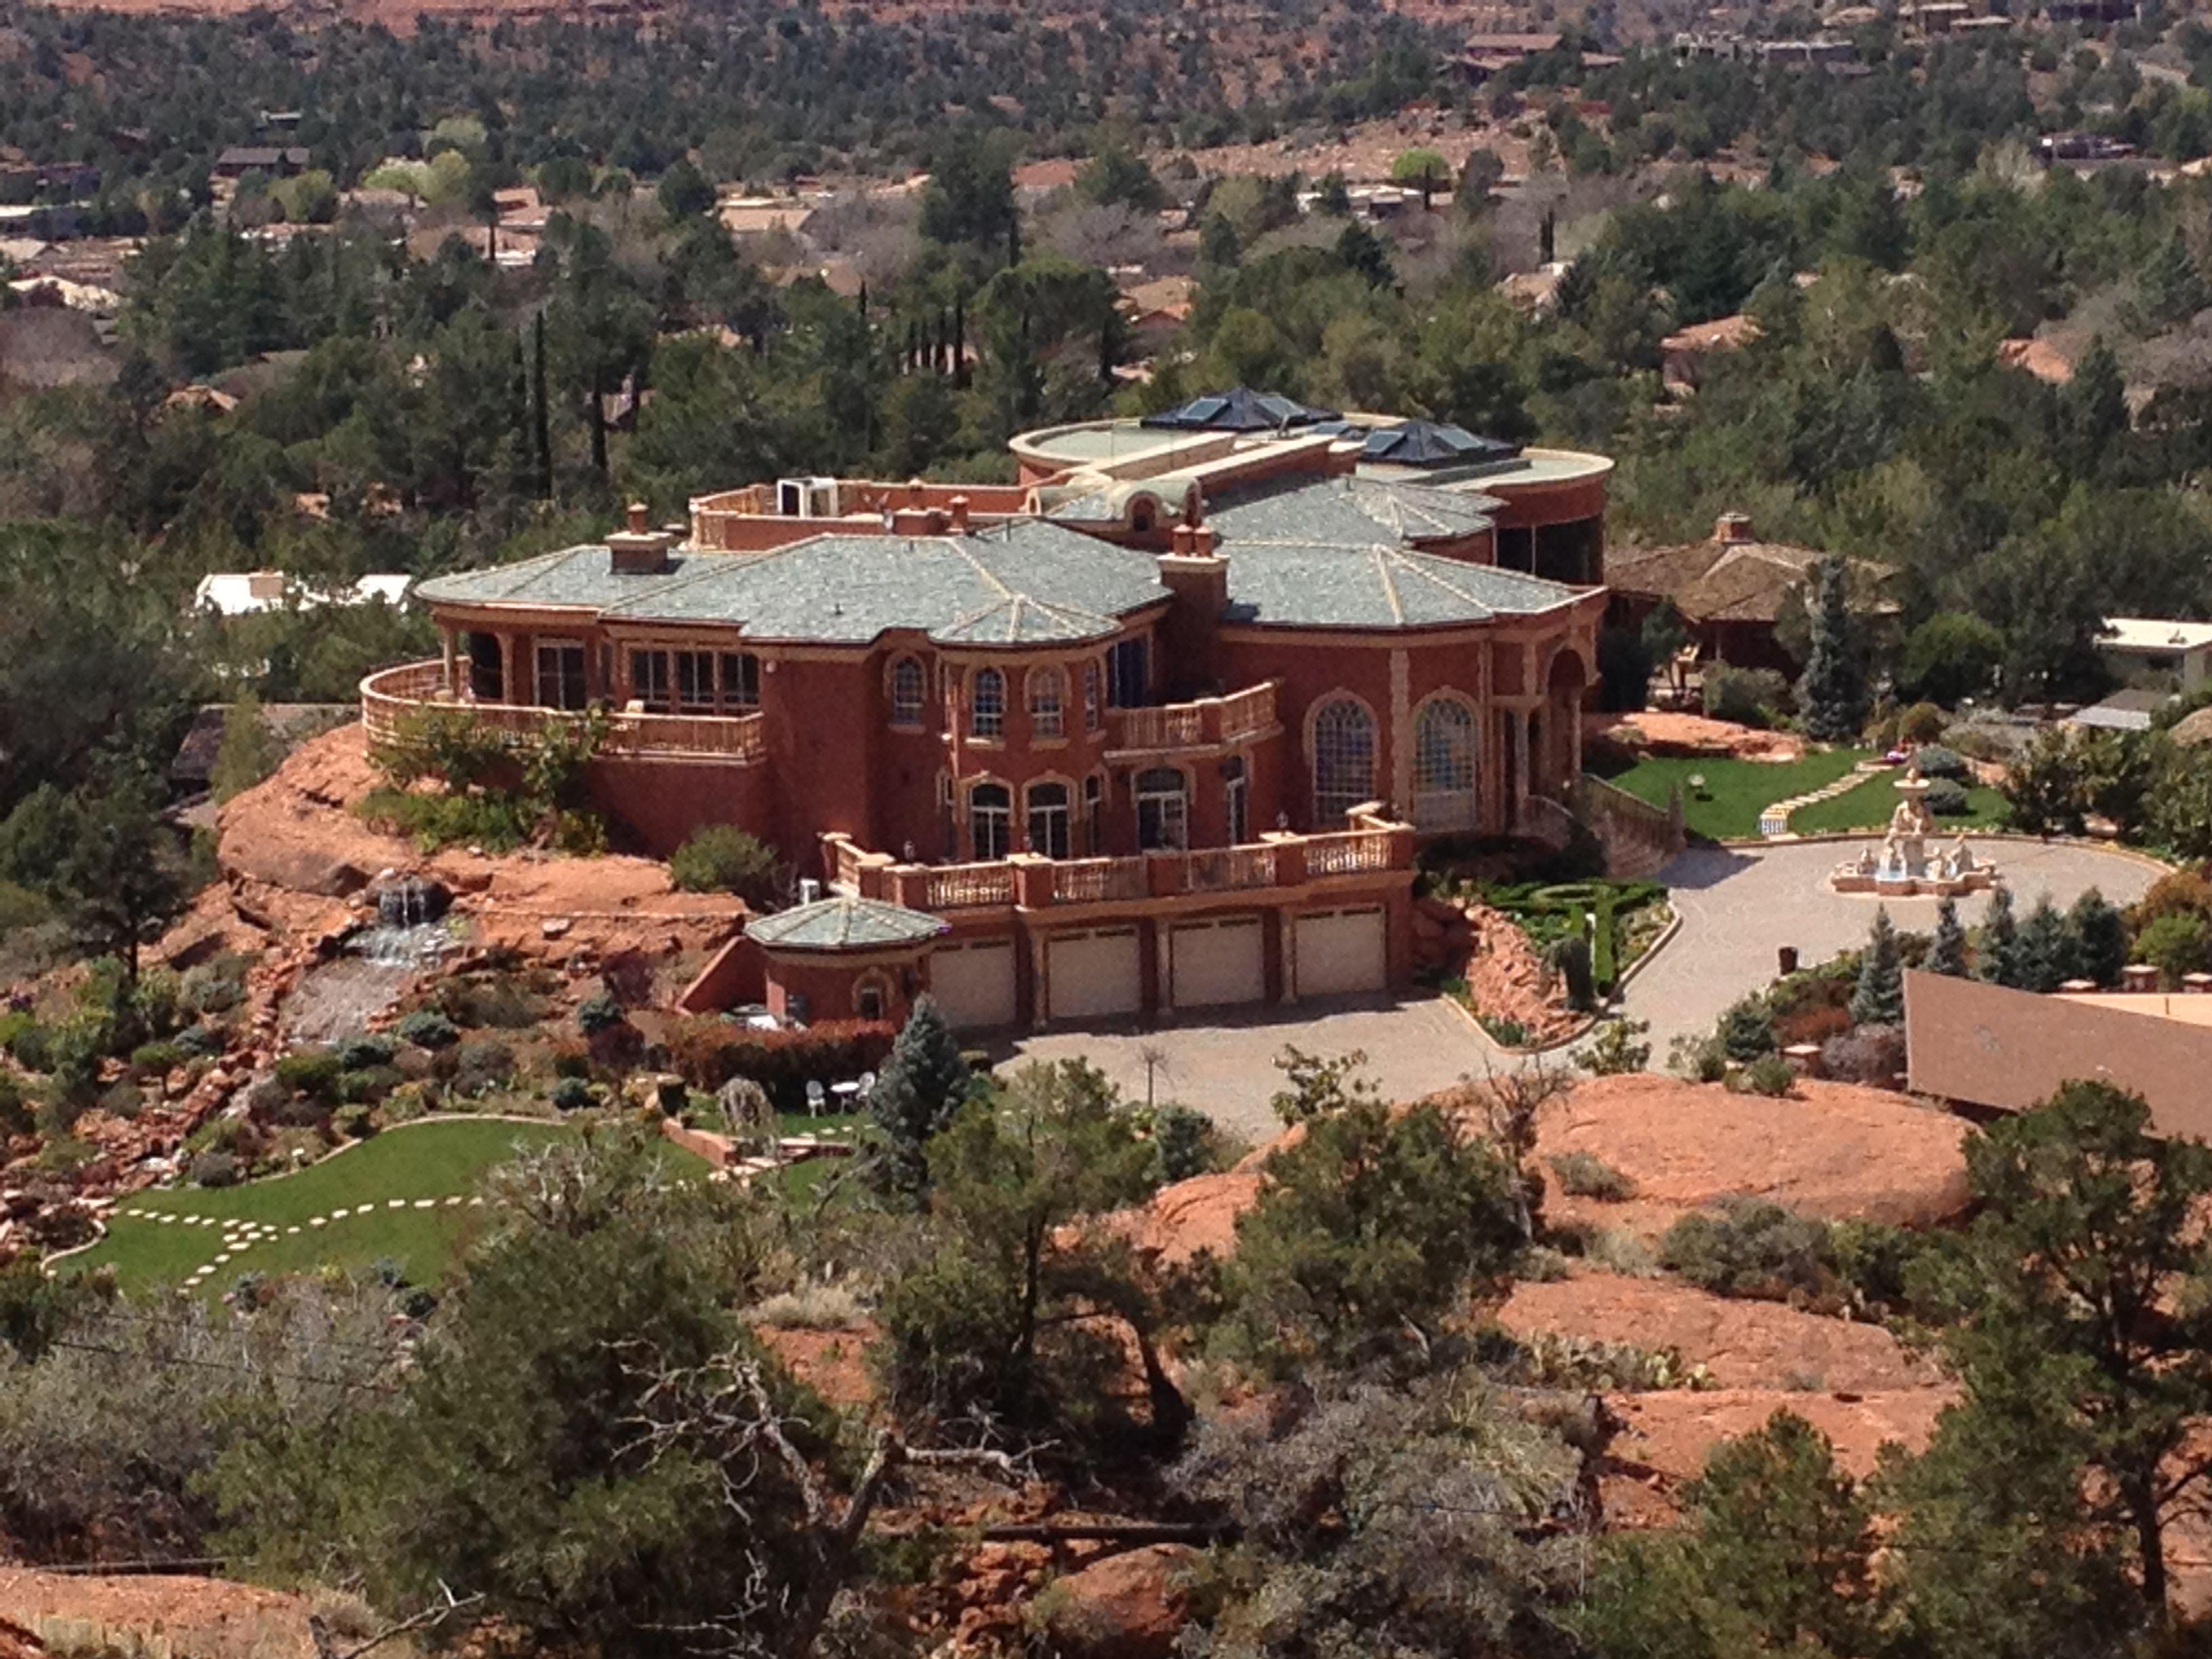 Desert mansion sedona arizona architecture houses for Sedona architects